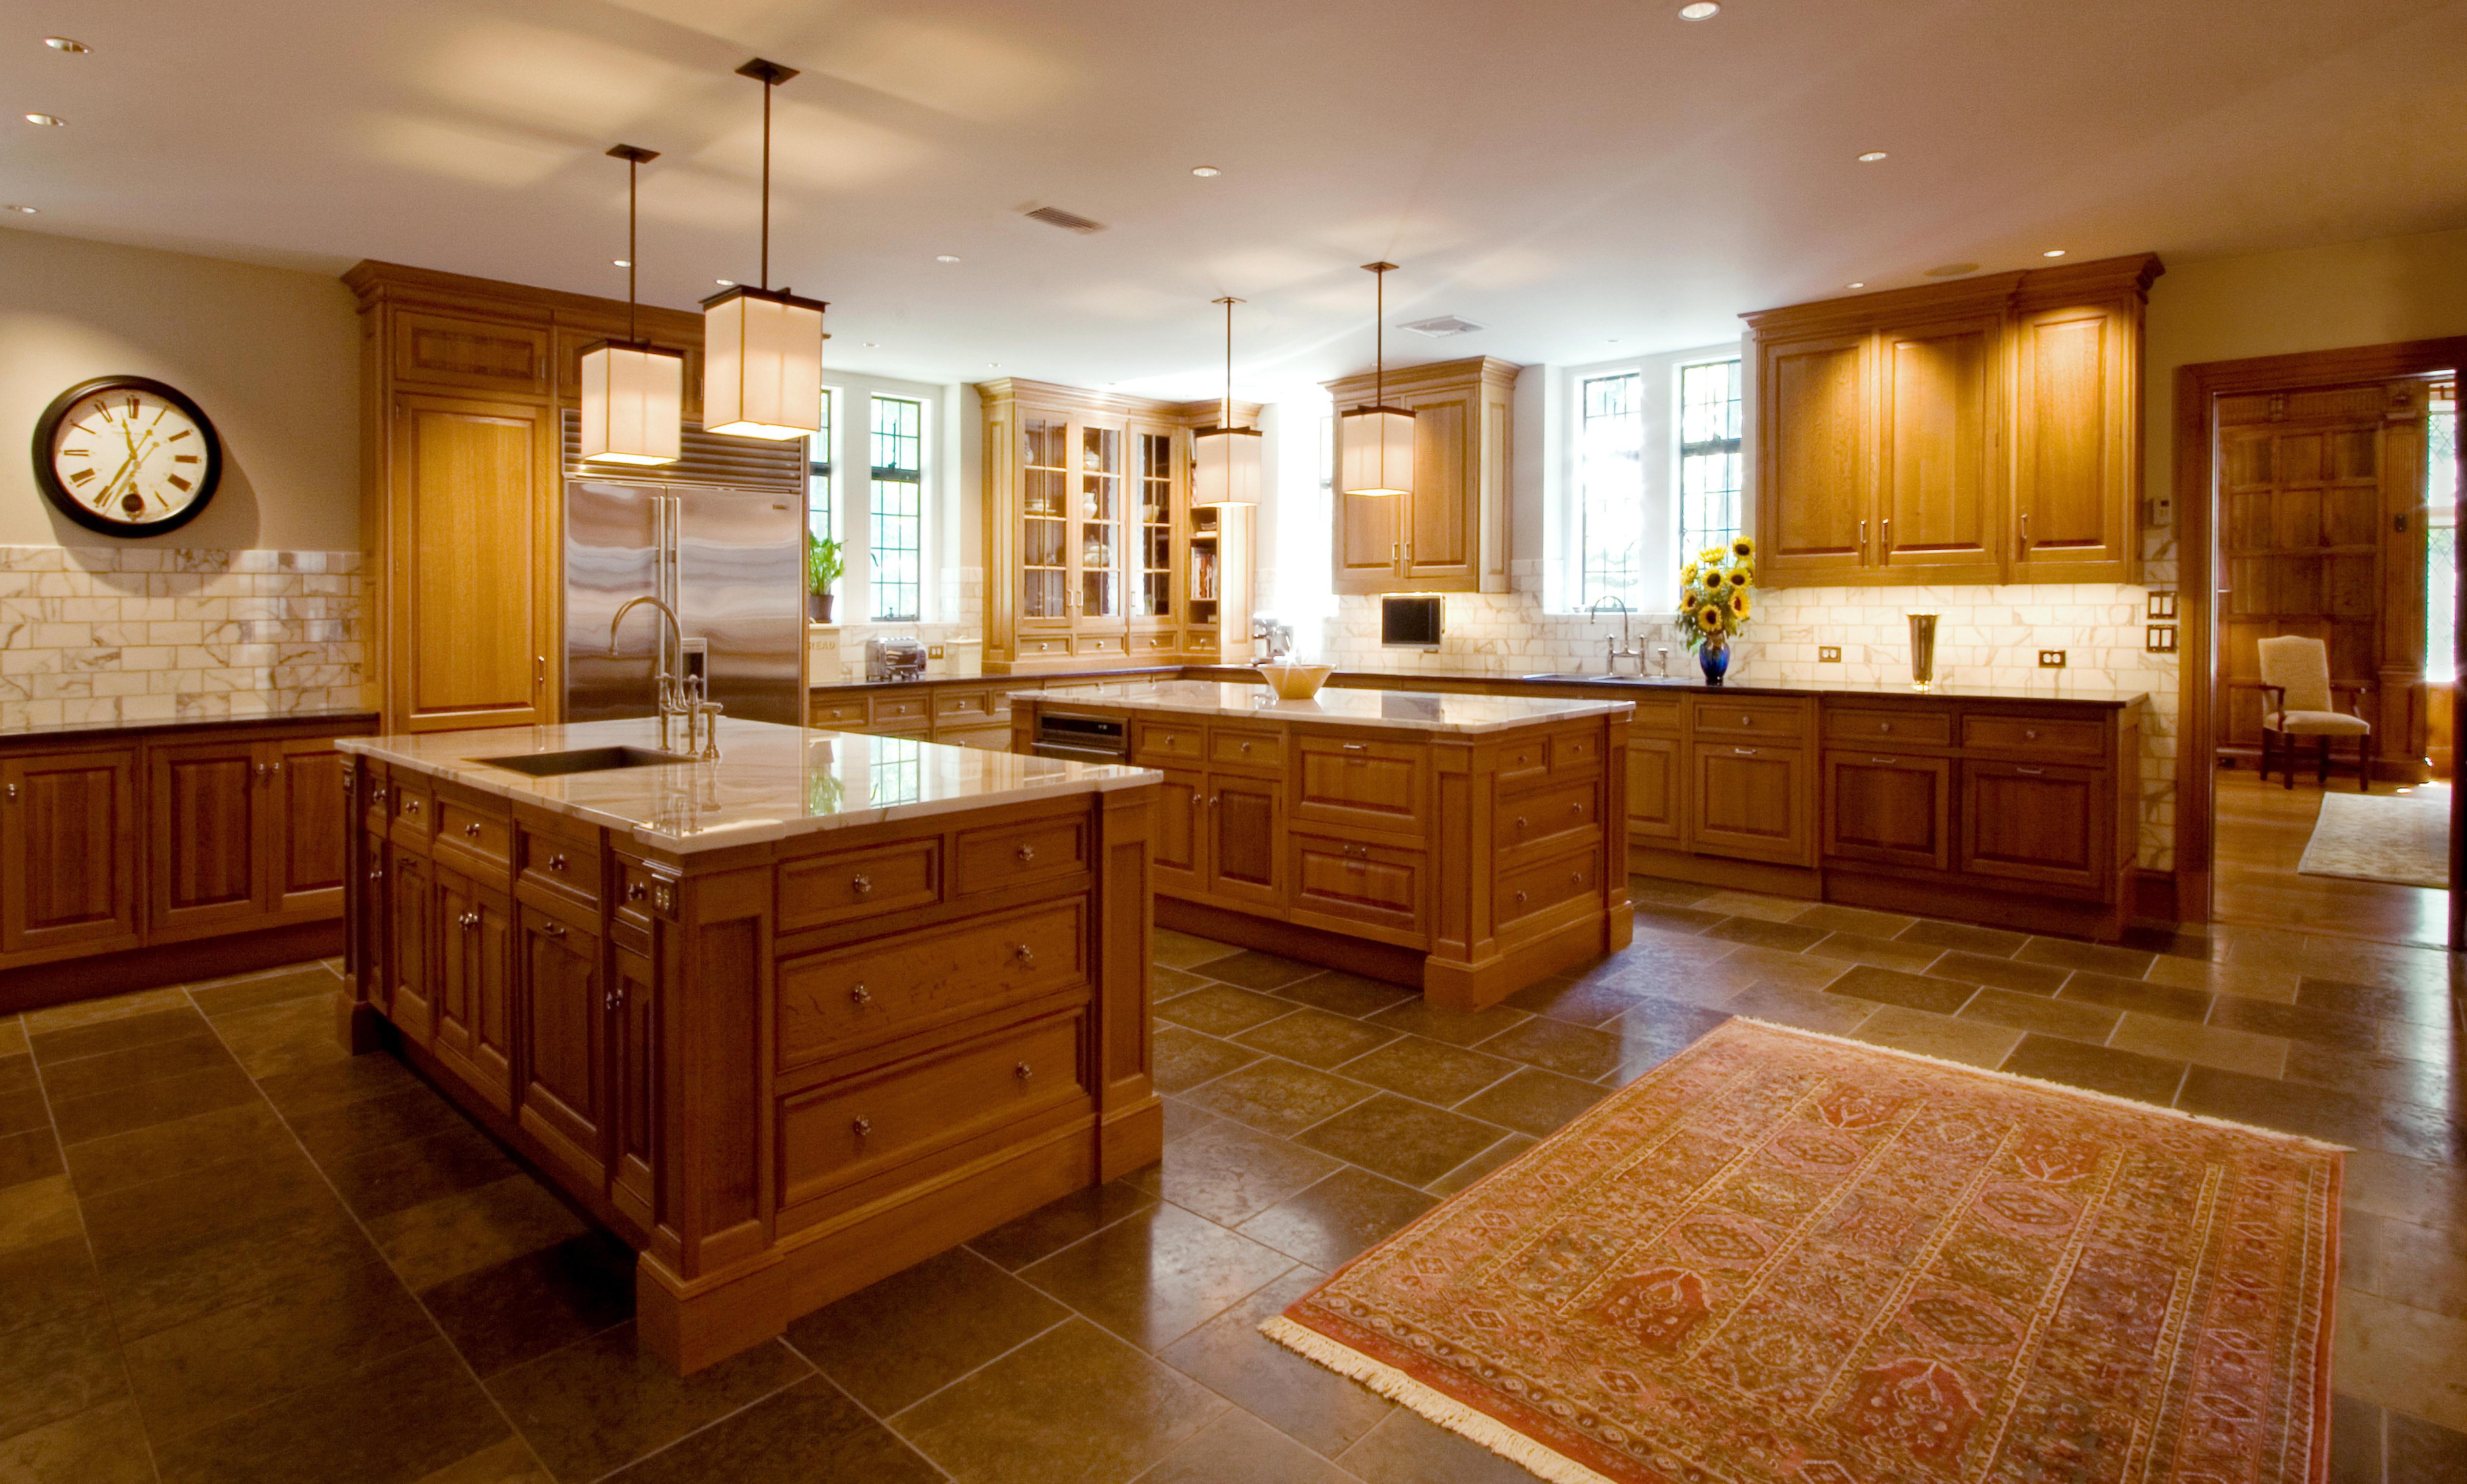 Incredible Double Island Kitchen Designs 5058 x 3043 · 2134 kB · jpeg